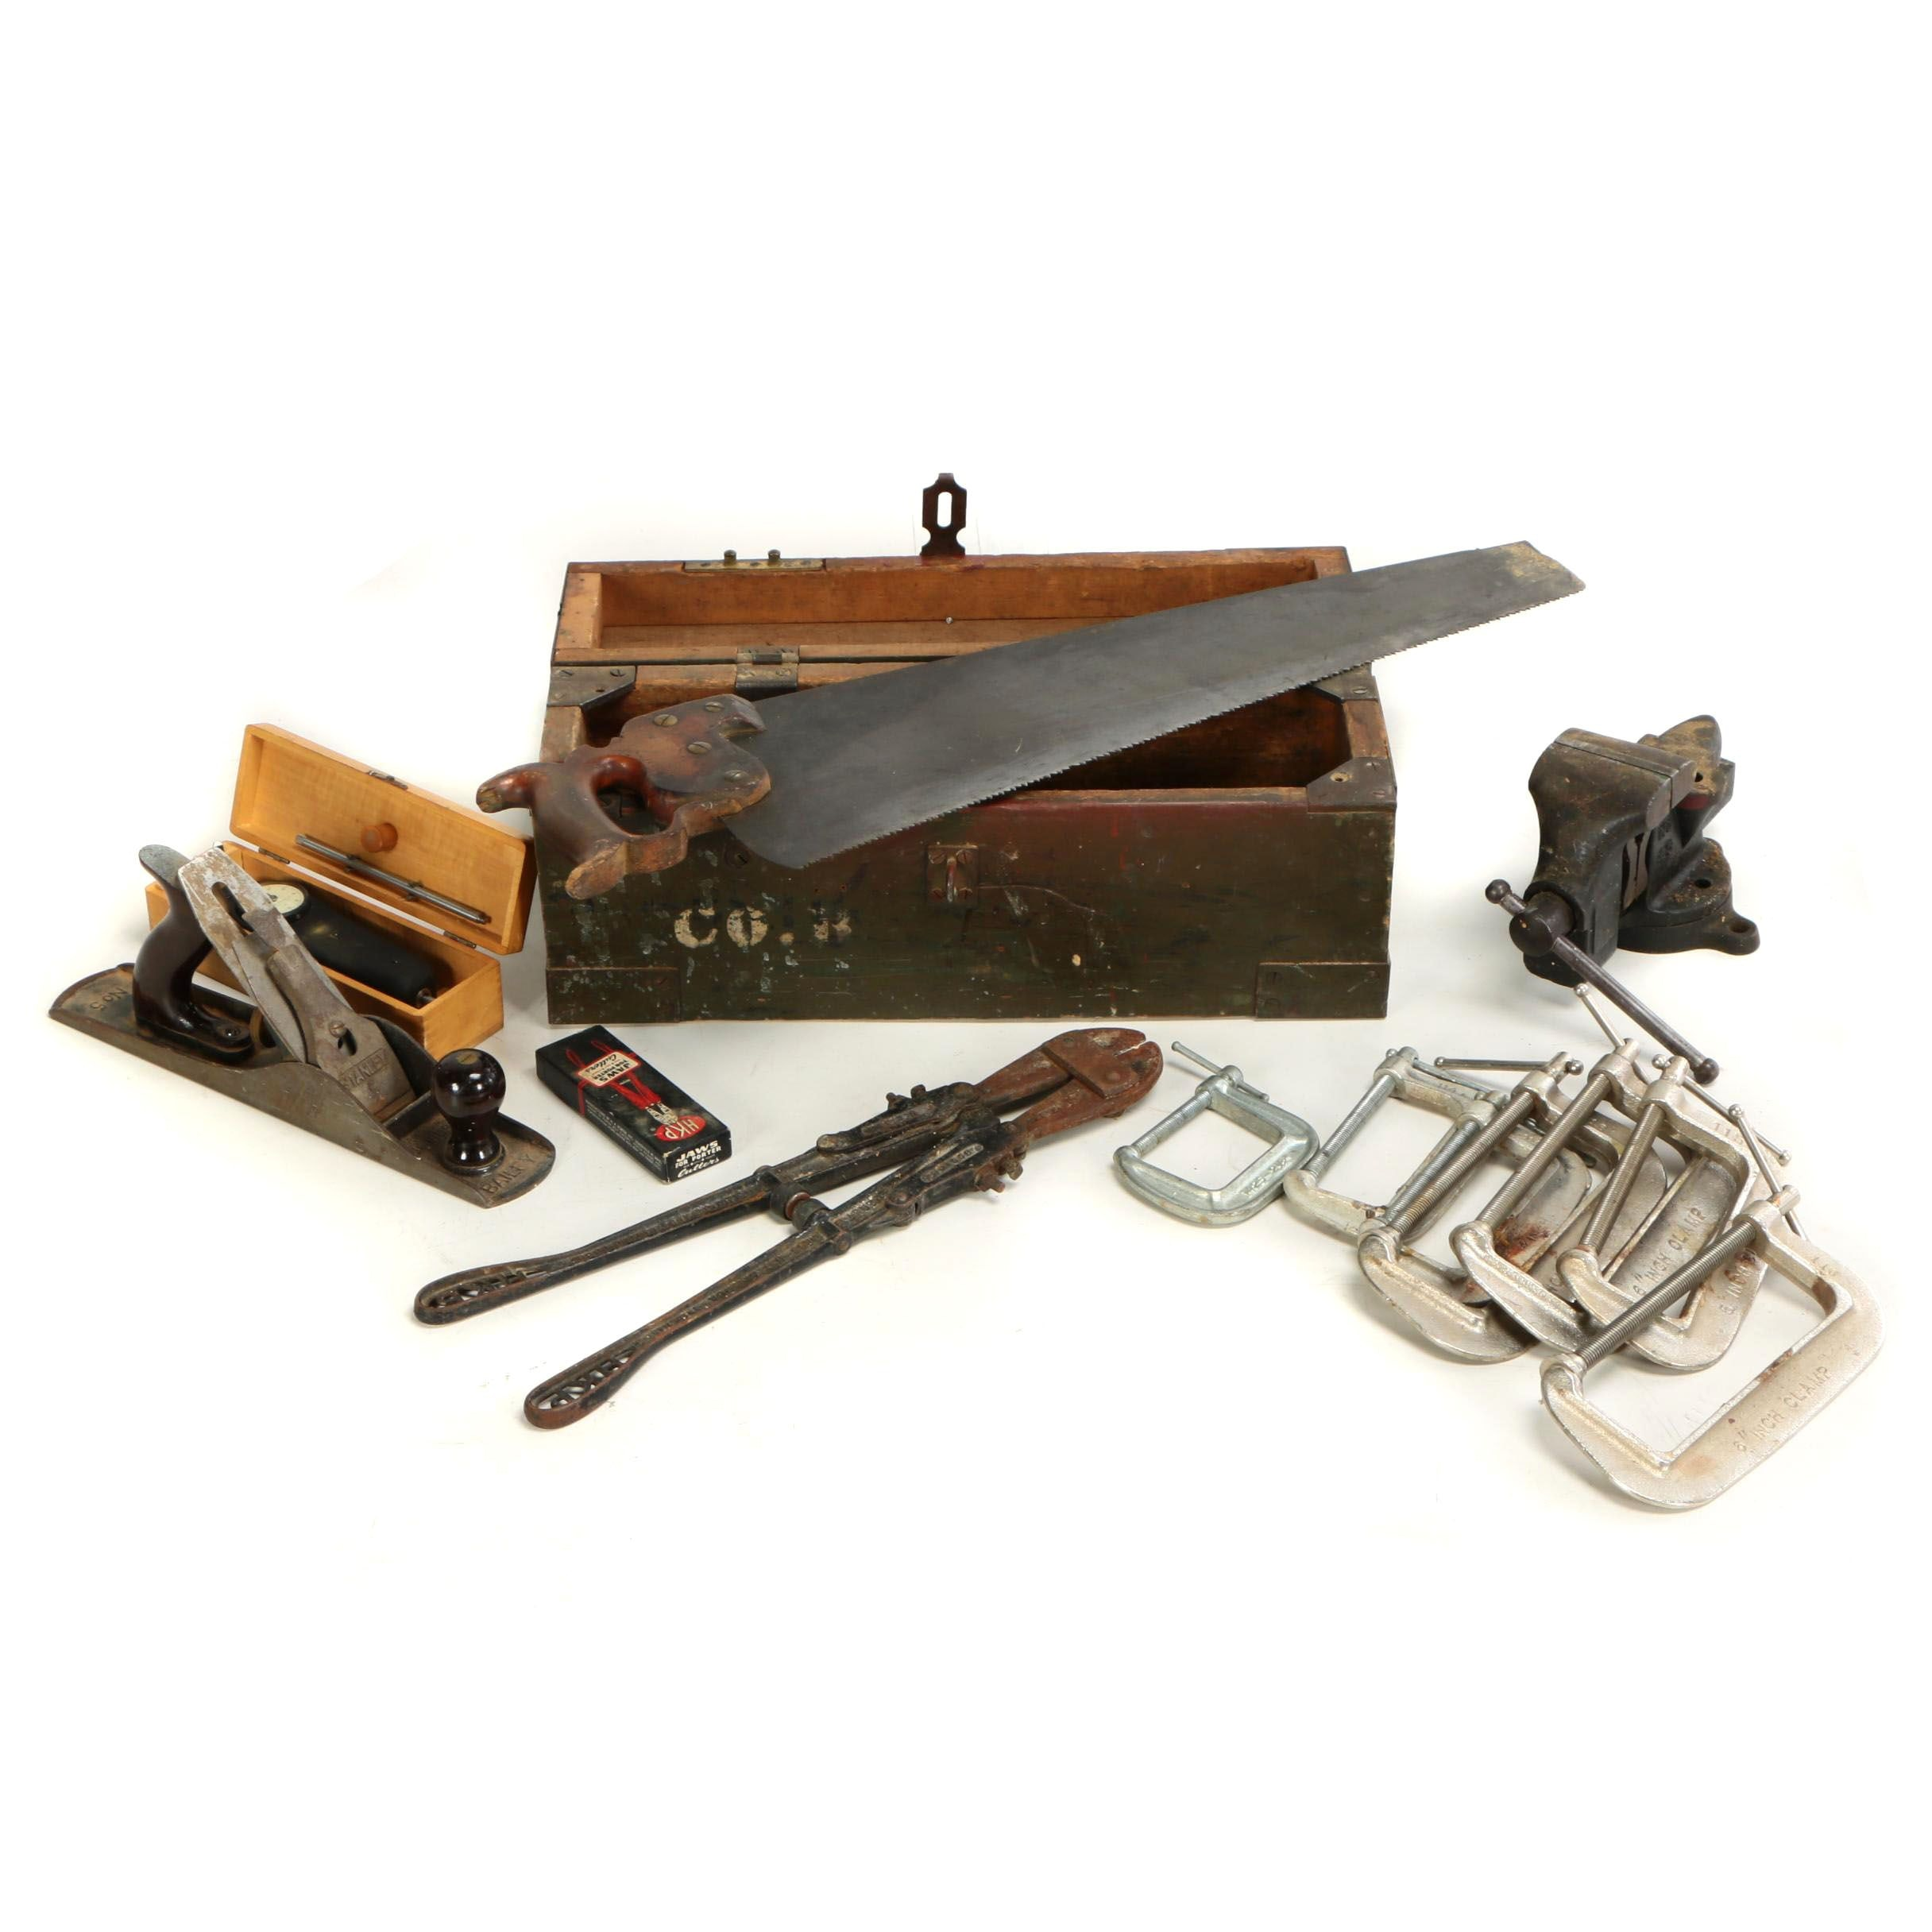 Hand Tools and Wooden Lockbox, Mid Century